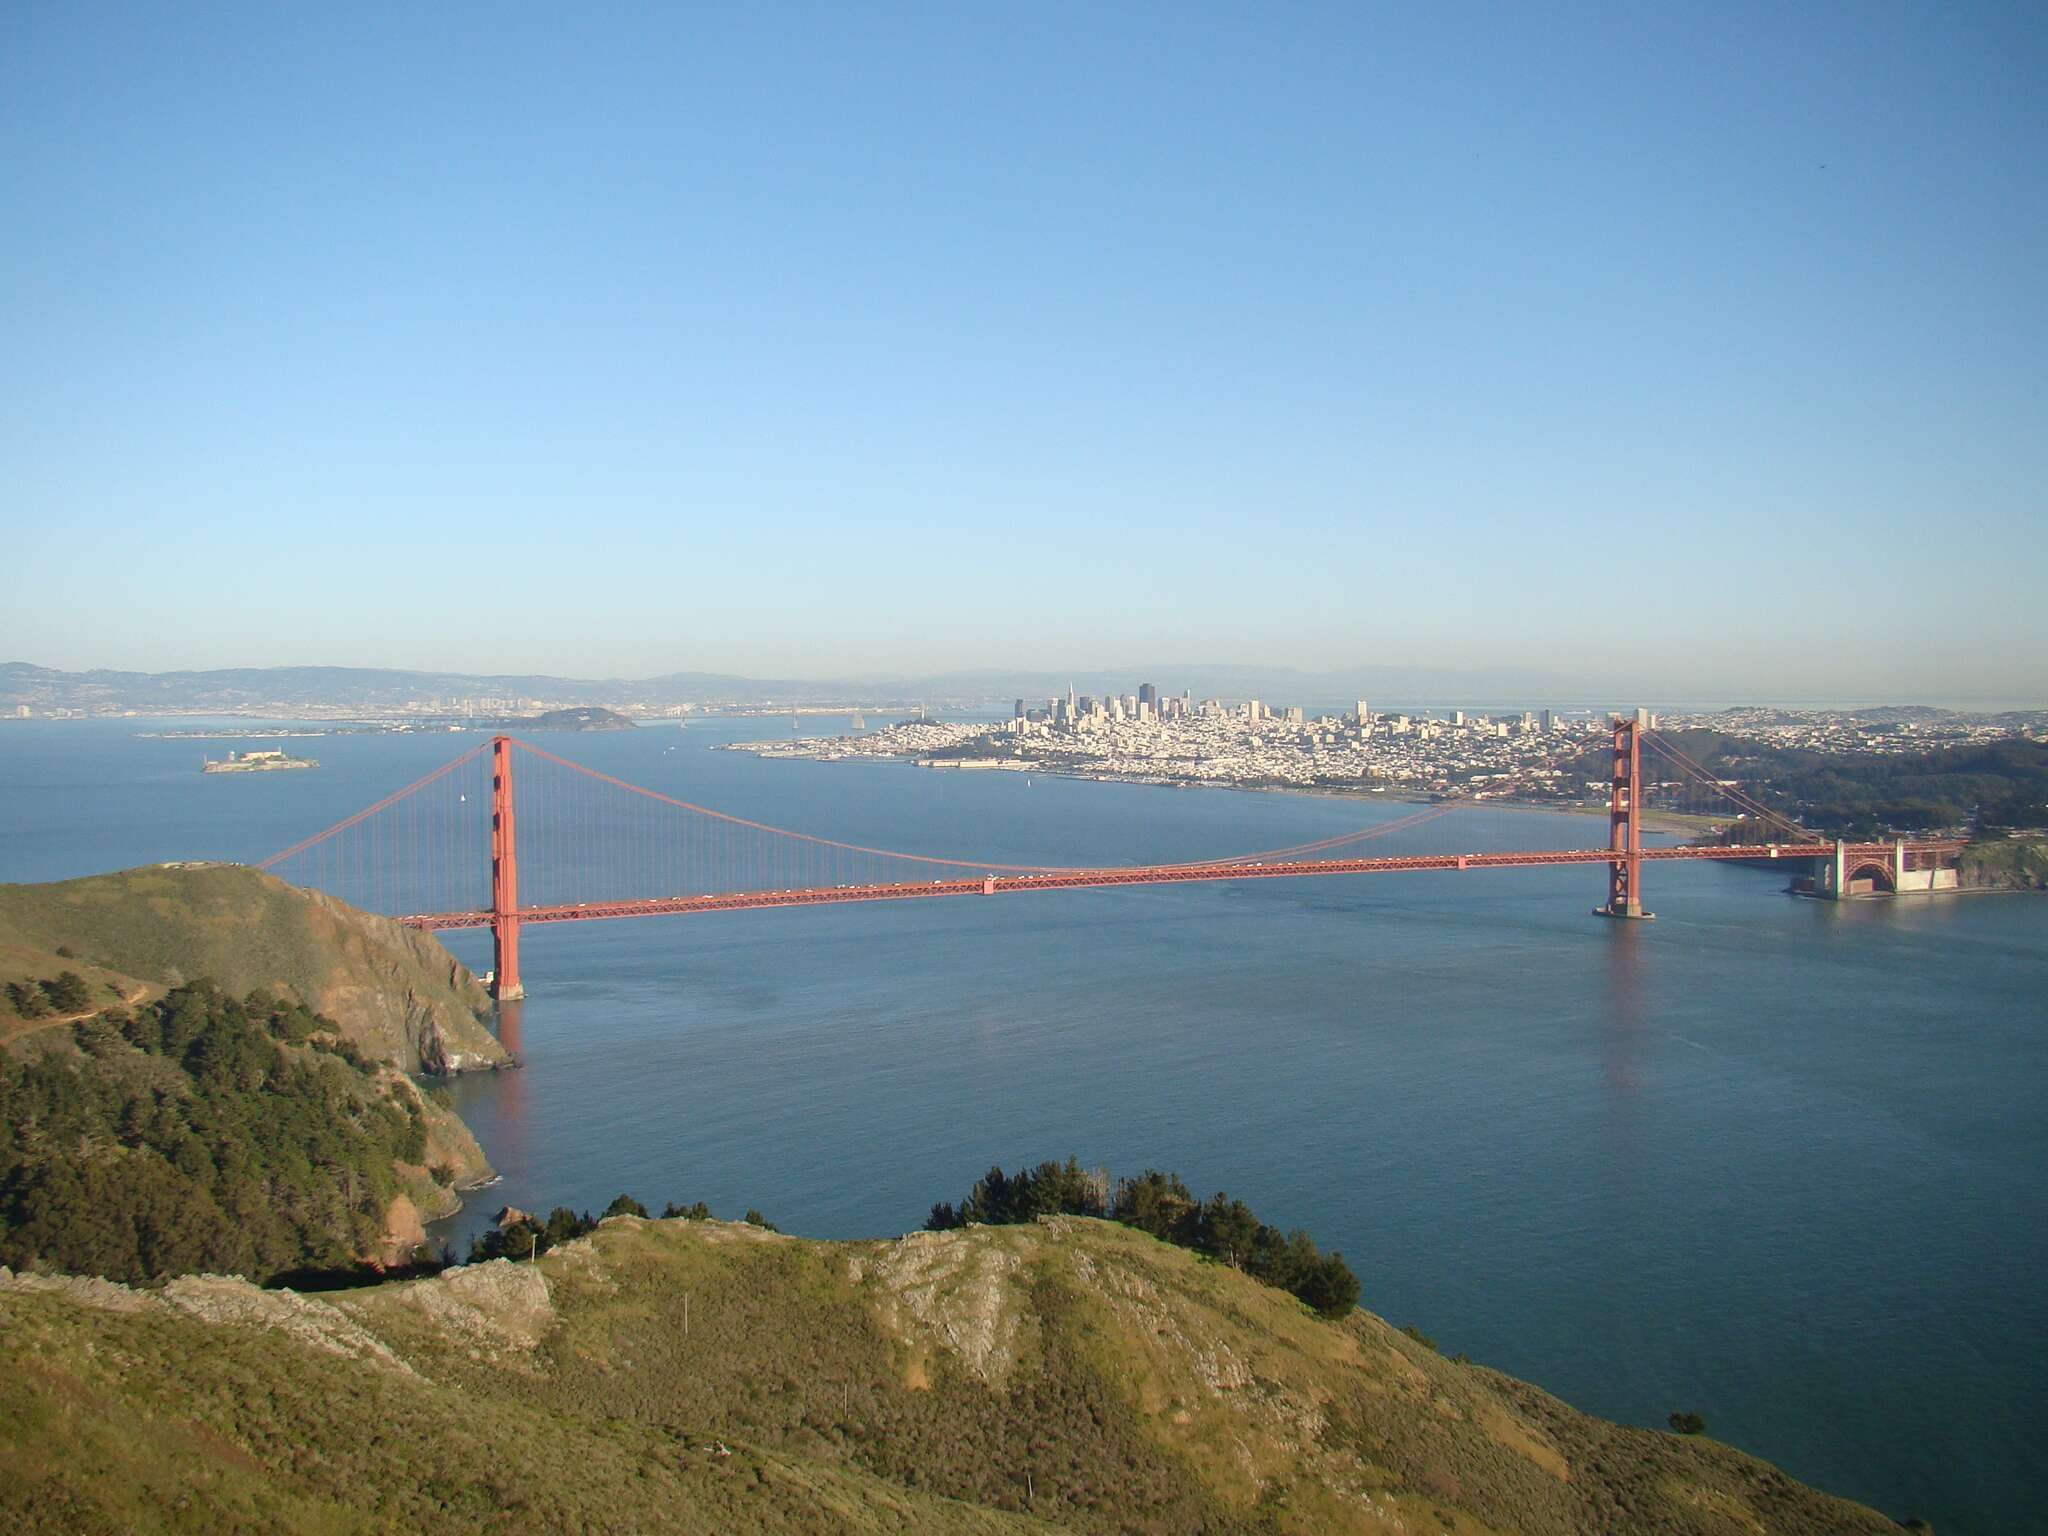 Golden Gate vista do alto do Marin Headlands